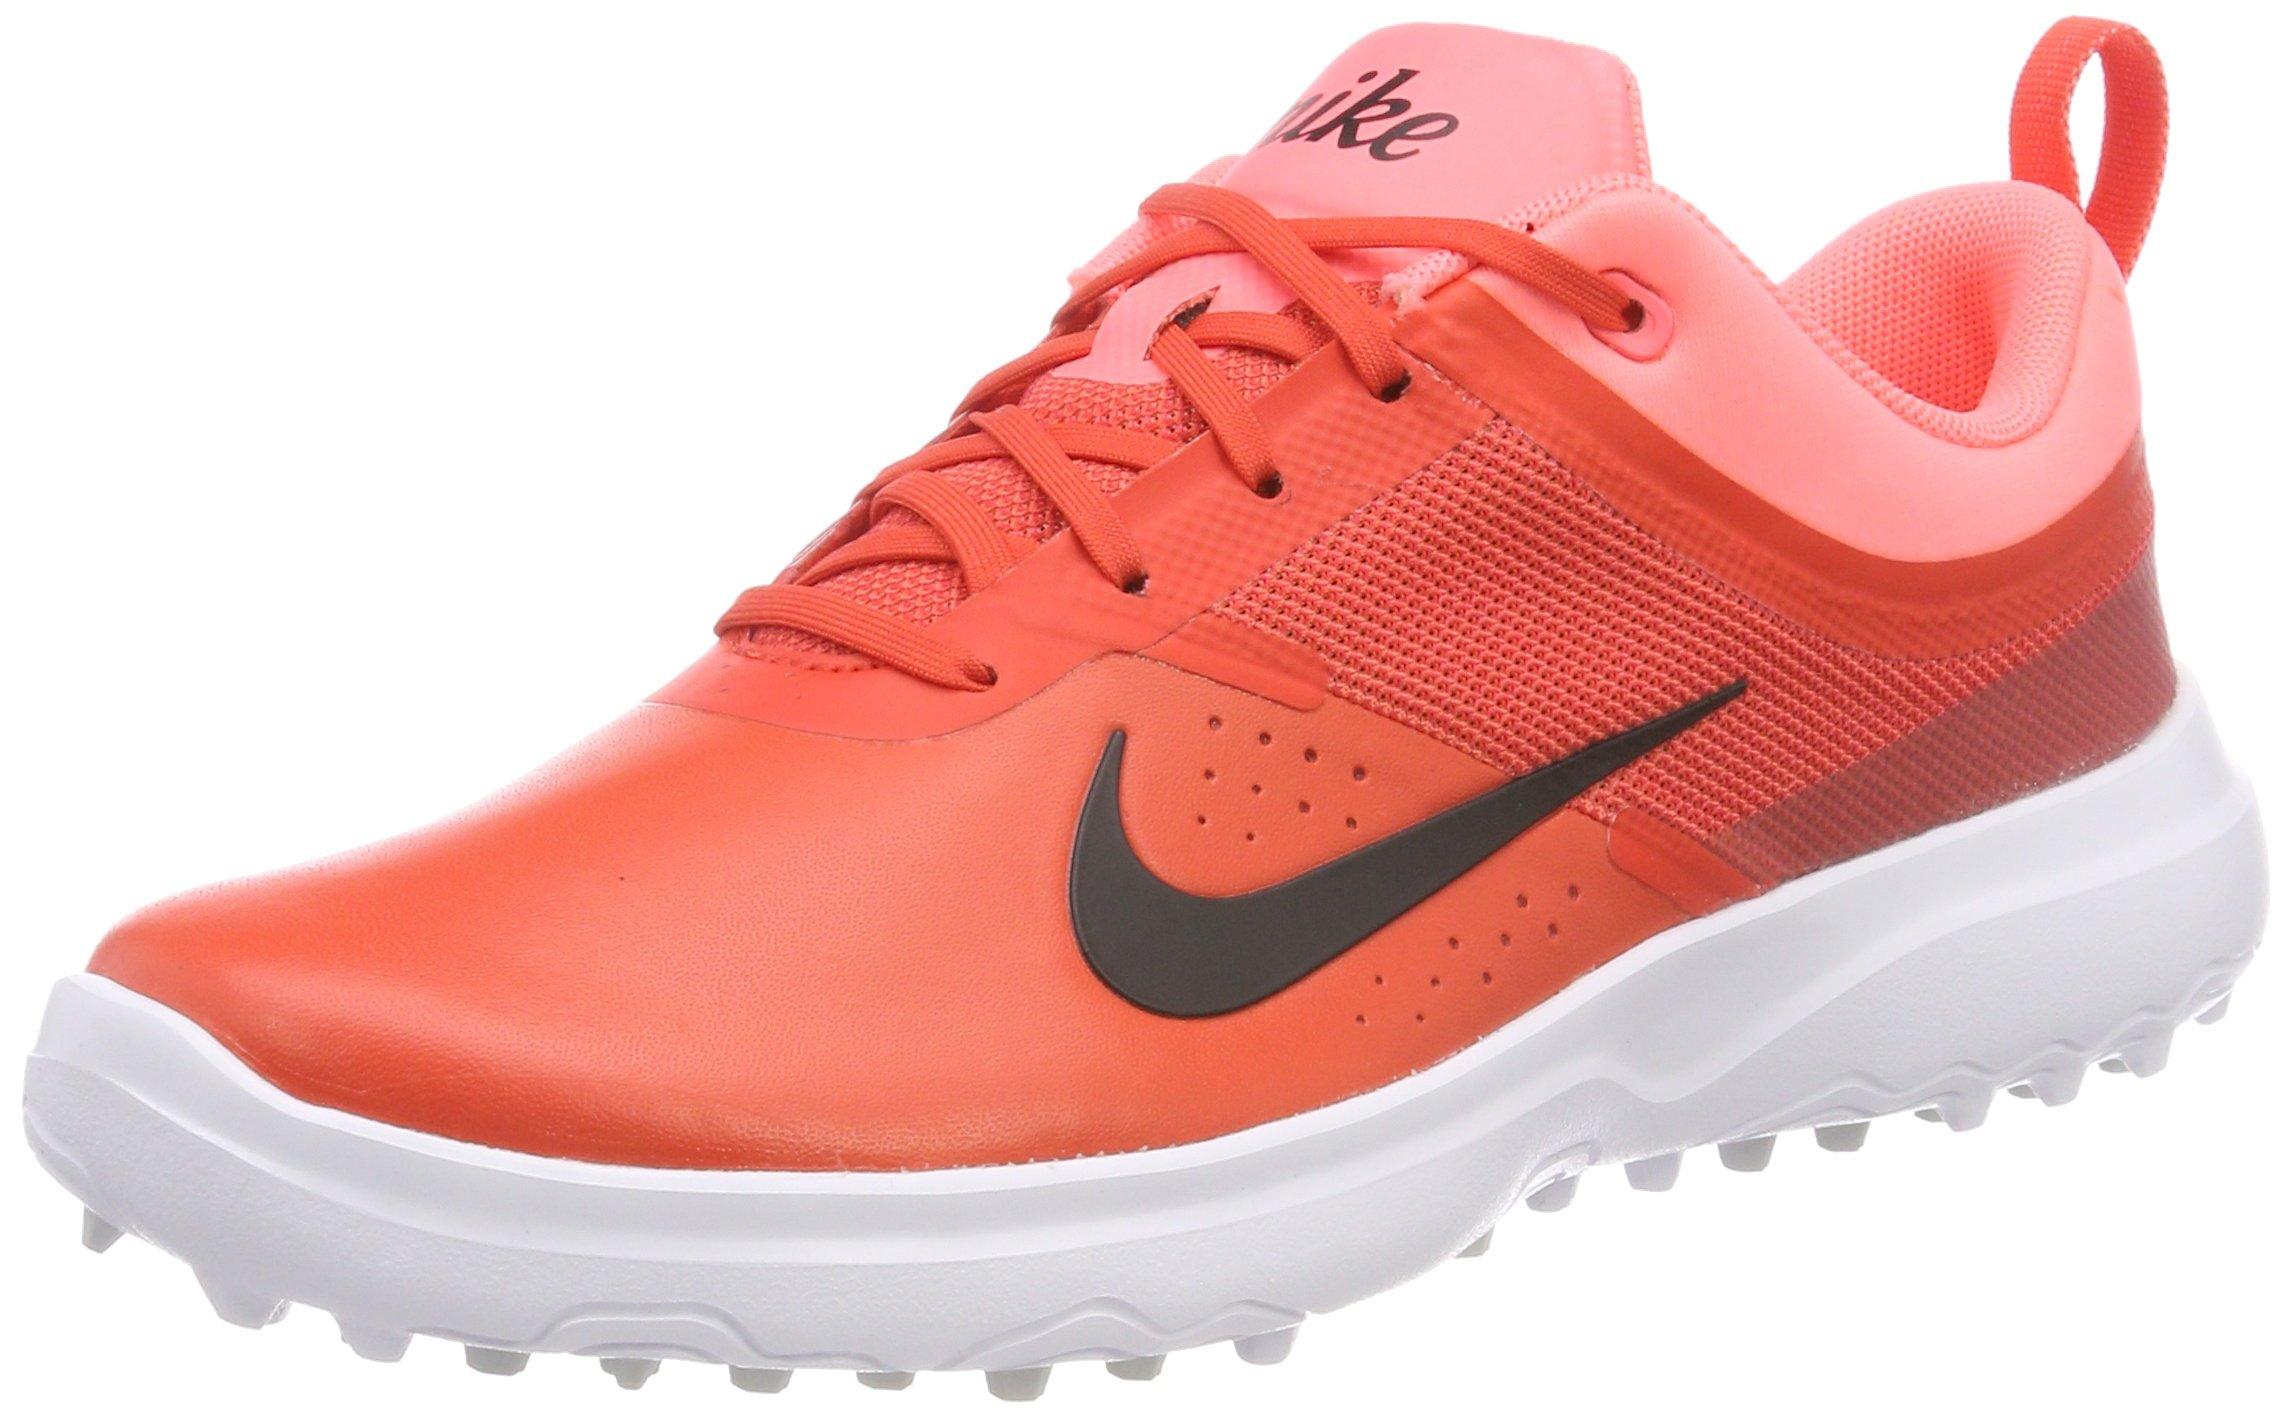 Nike AKAMAI Spikeless Golf Shoes 2017 Women Max Orange/Black/Lava Glow Medium 7